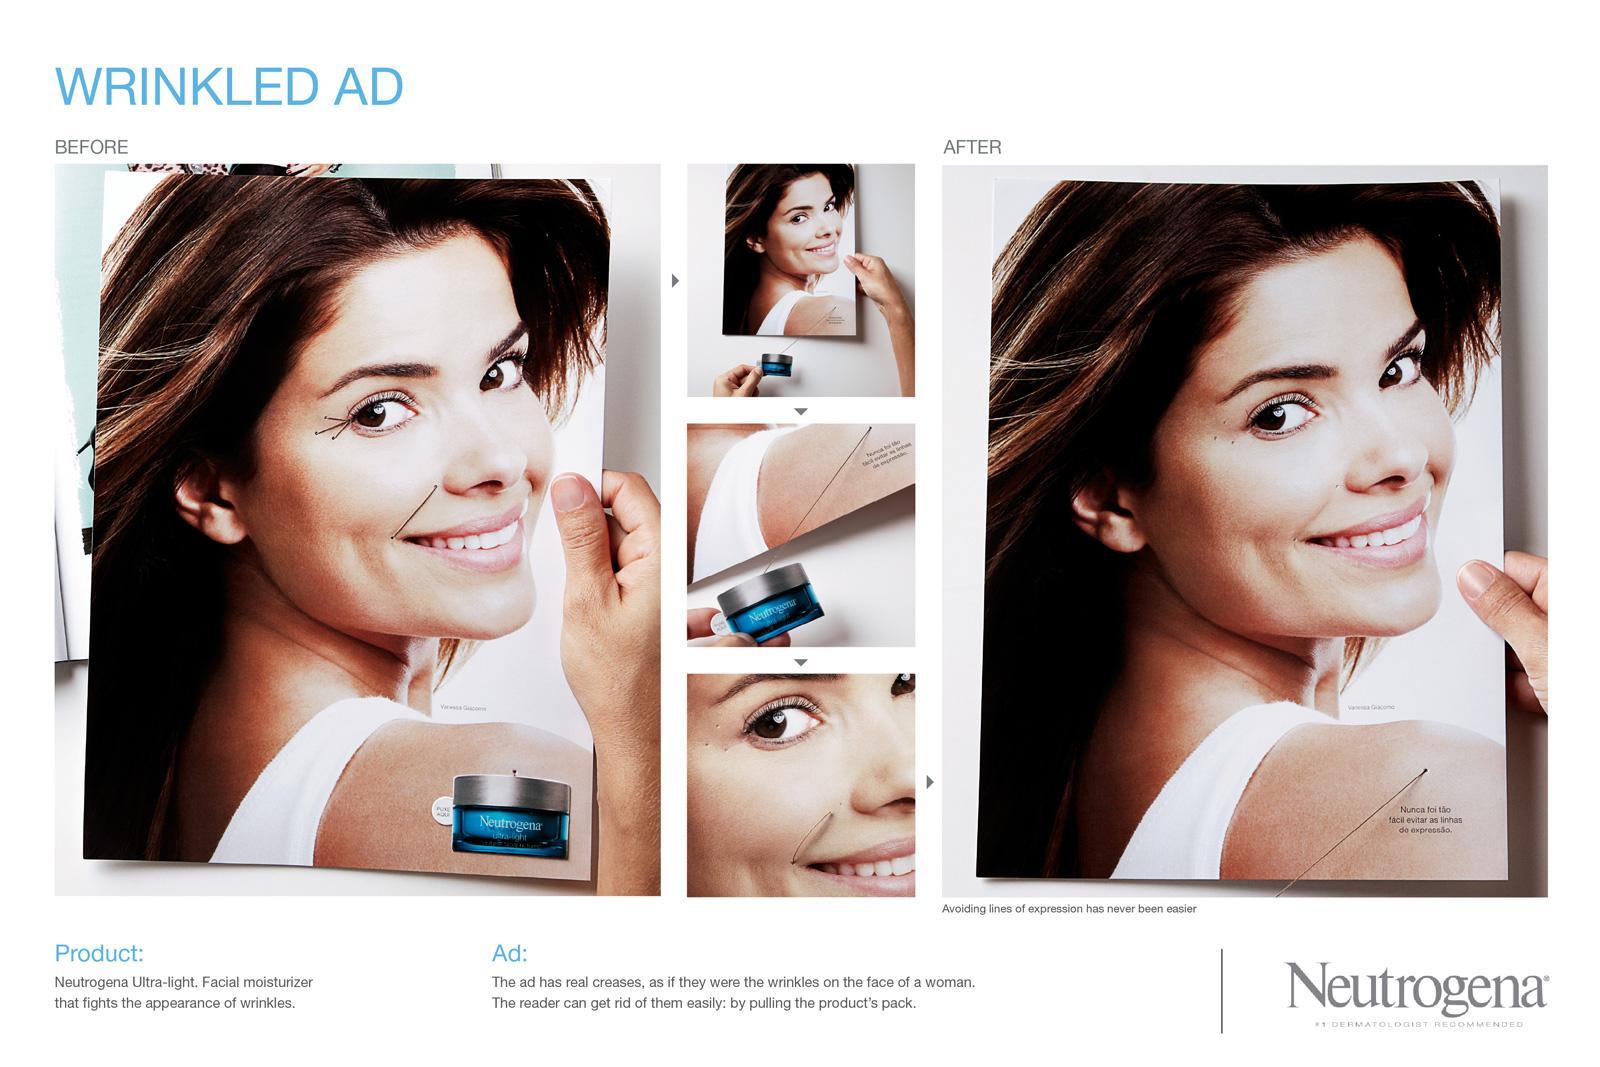 Neutrogena Direct Ad -  Wrinkled ad